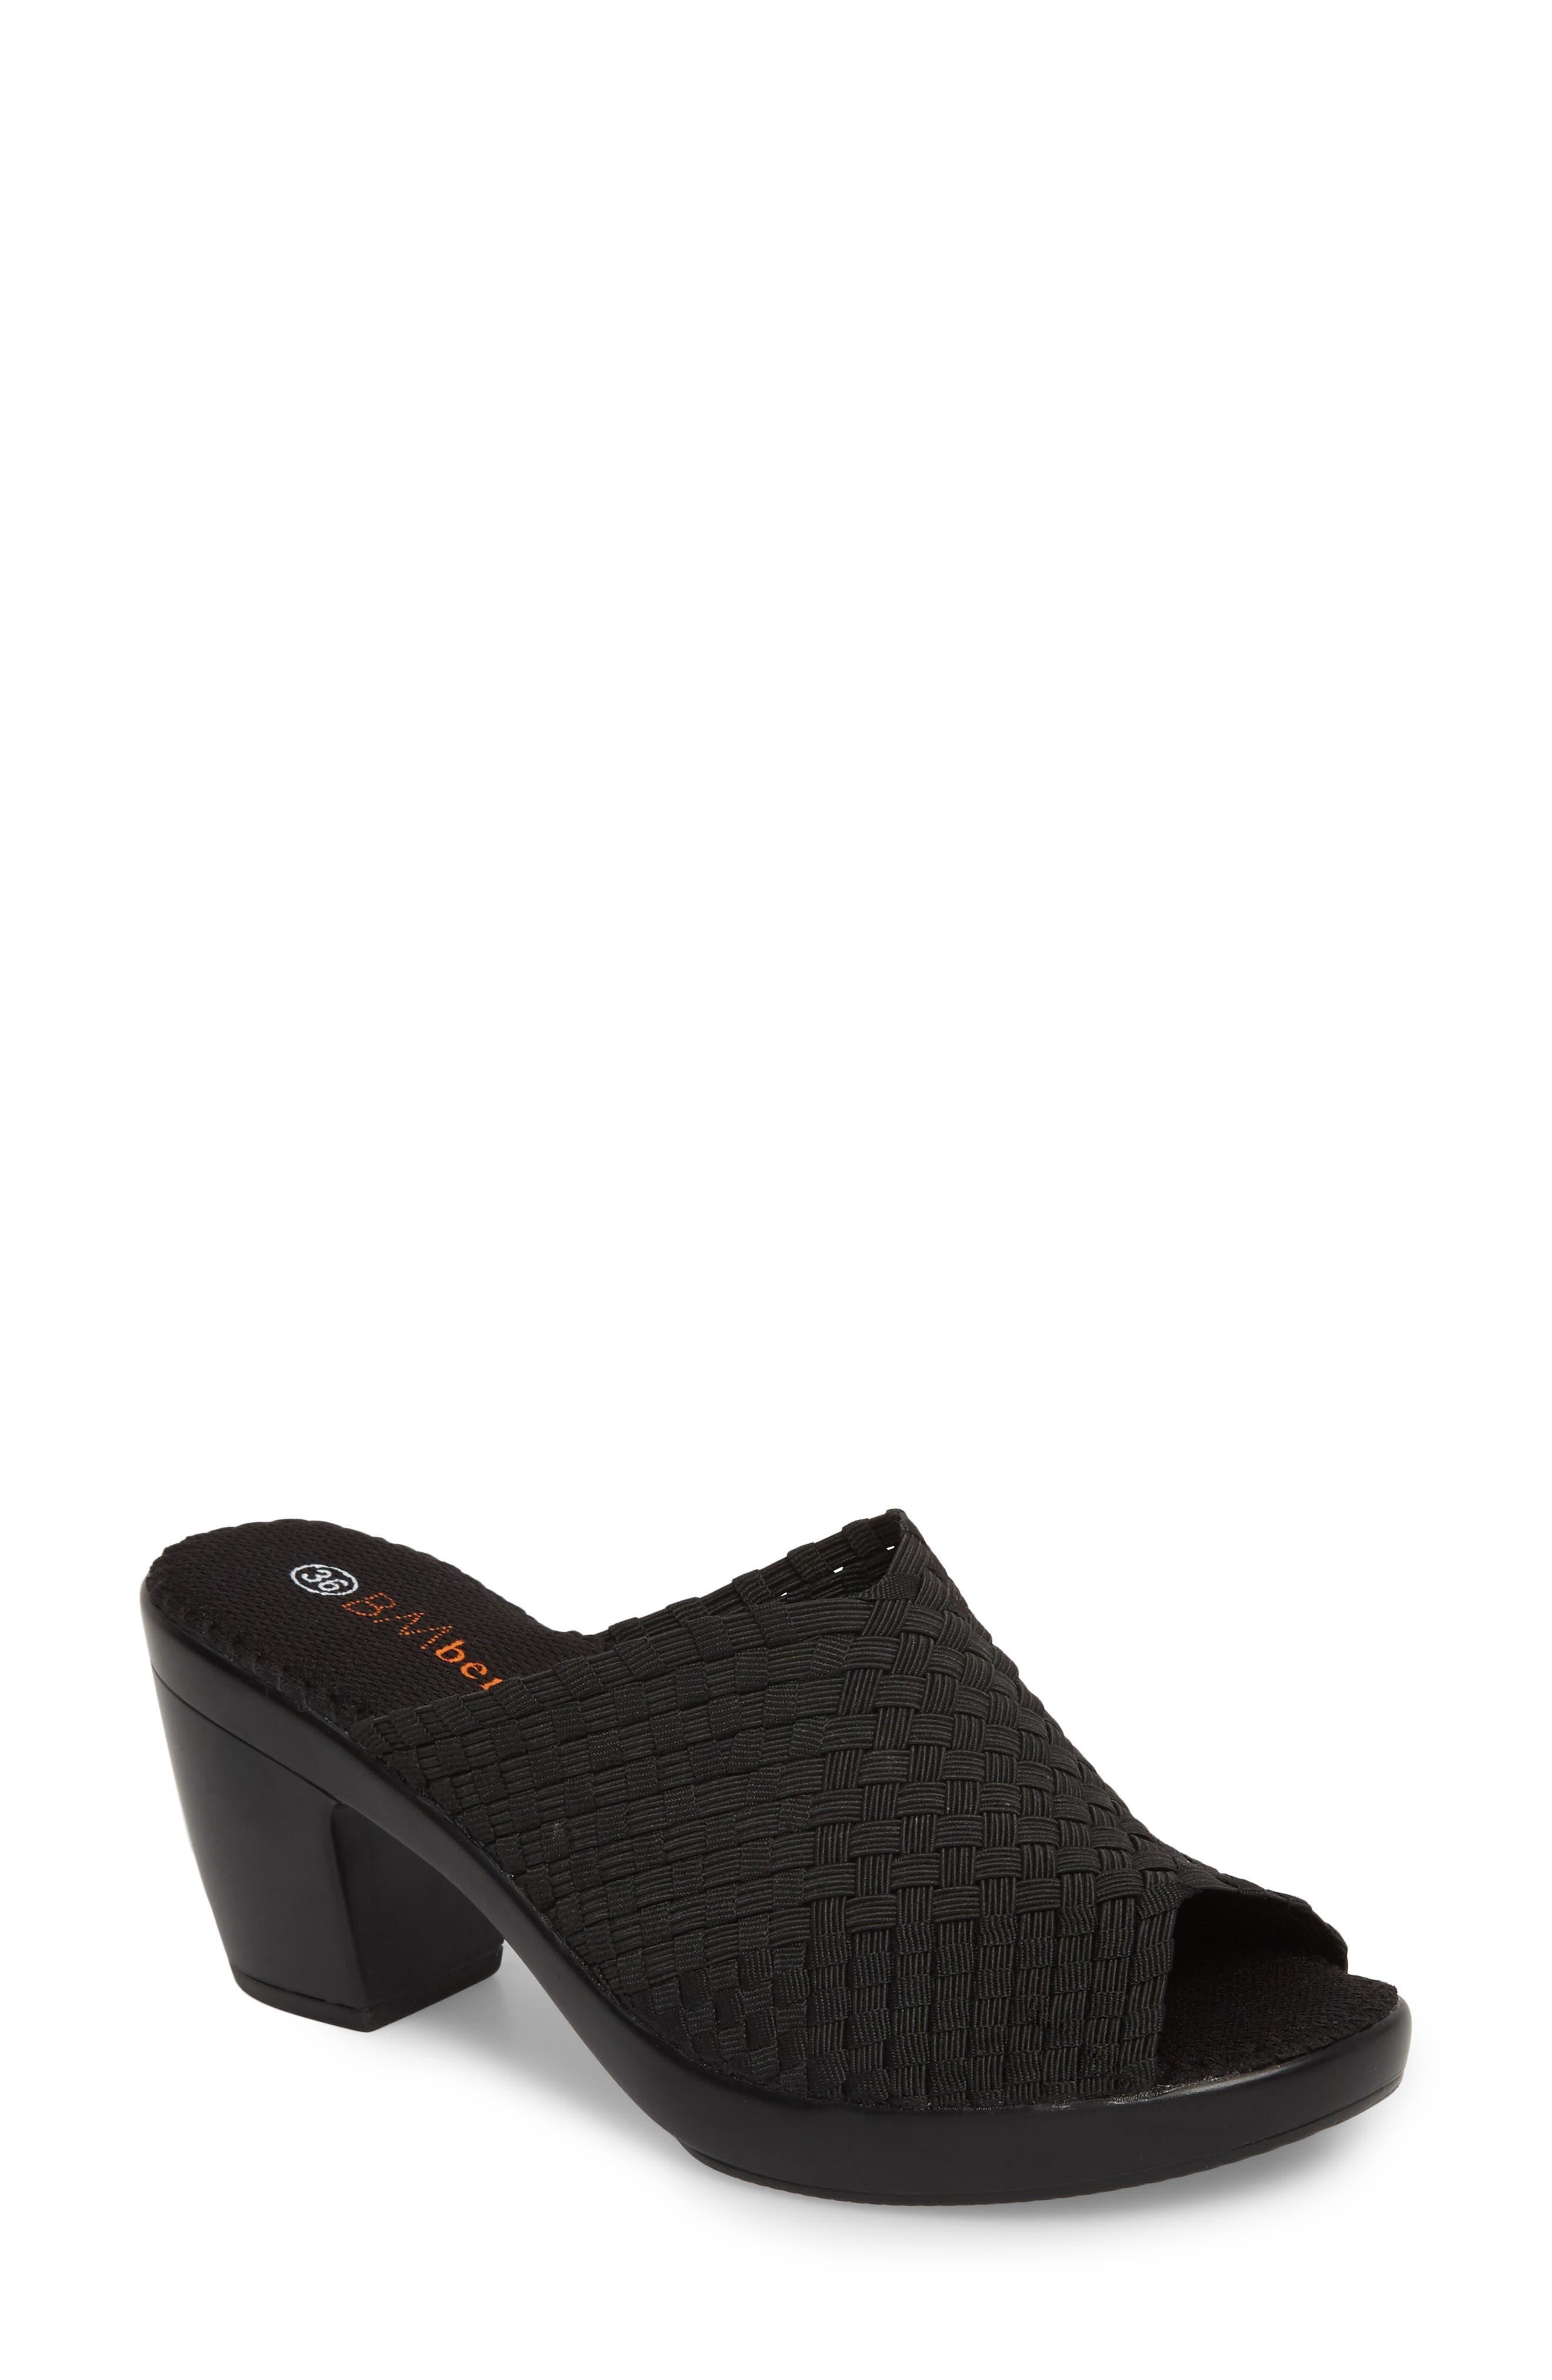 Sun Texas Sandal,                             Main thumbnail 1, color,                             BLACK FABRIC